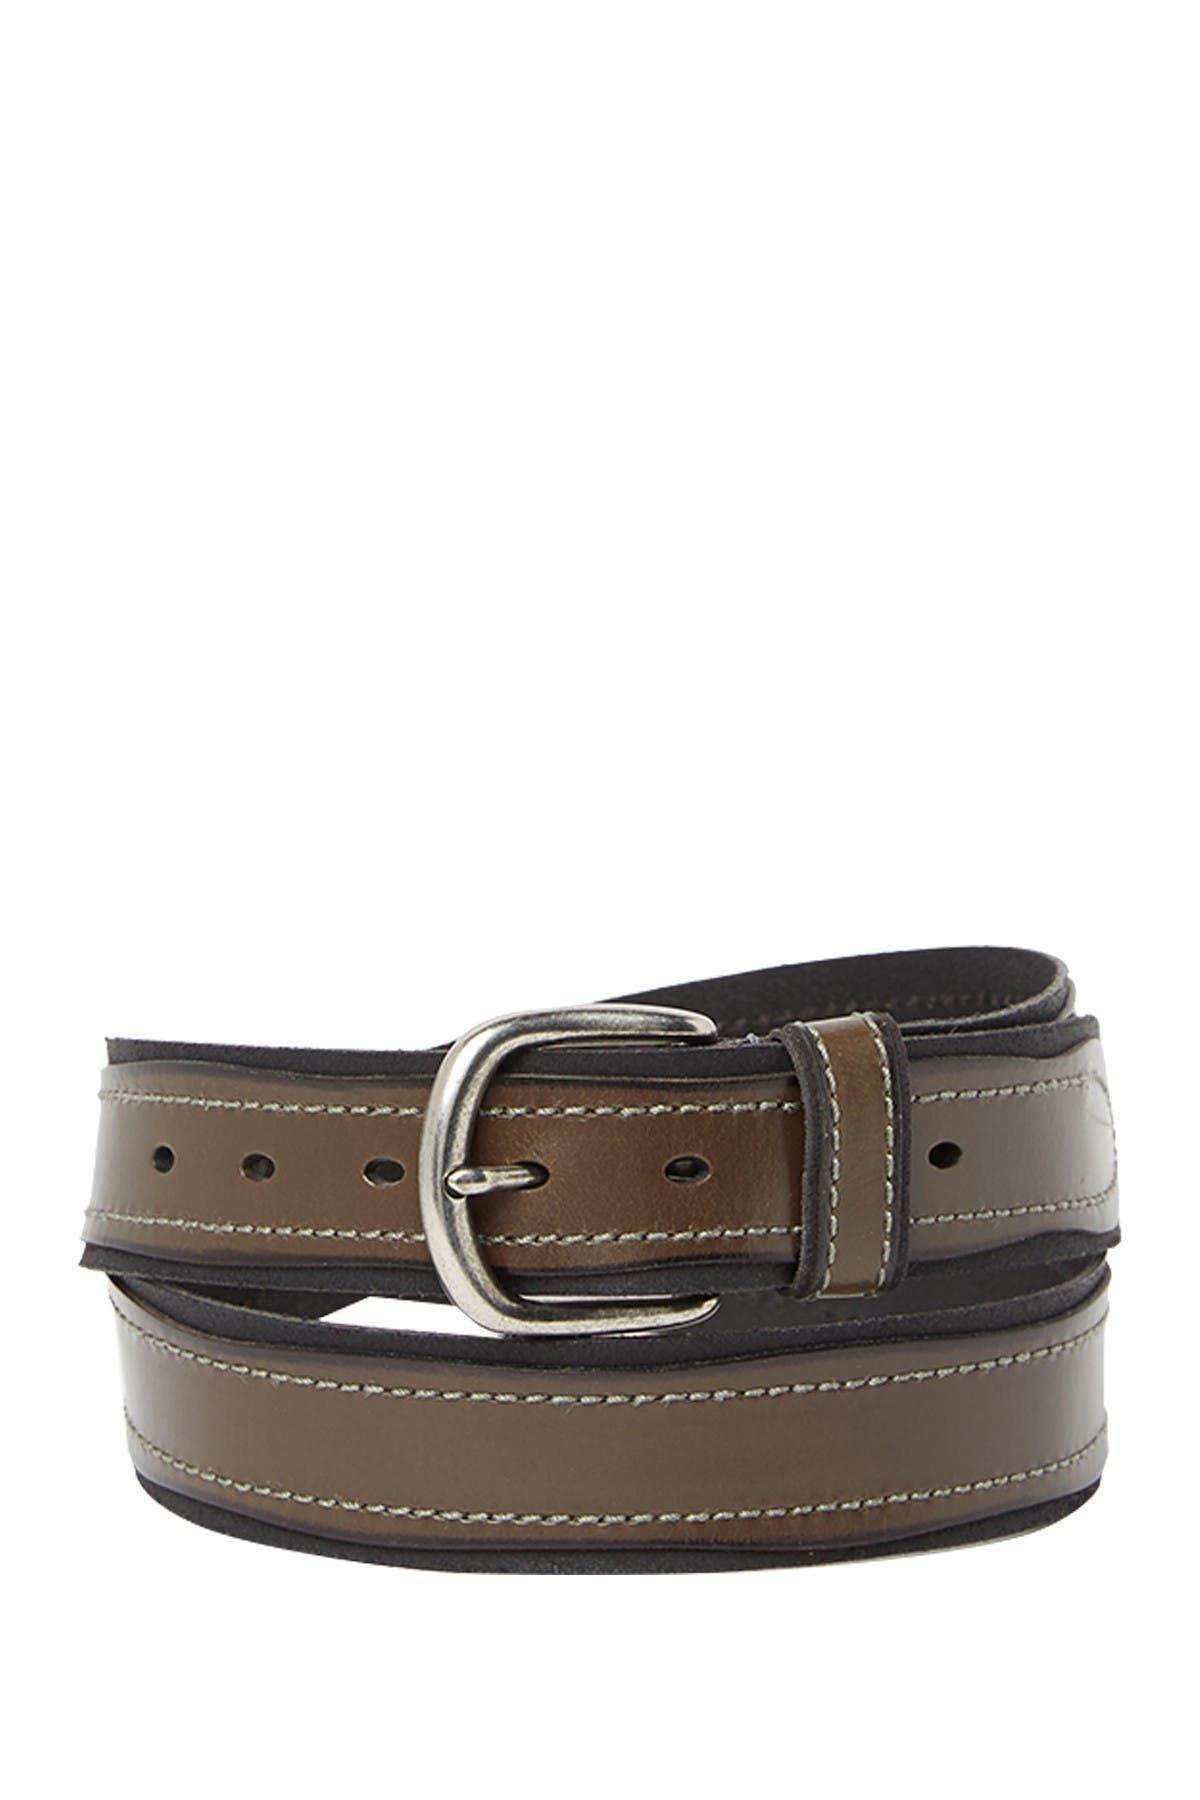 Image of John Varvatos Collection Pop Suede Leather Belt